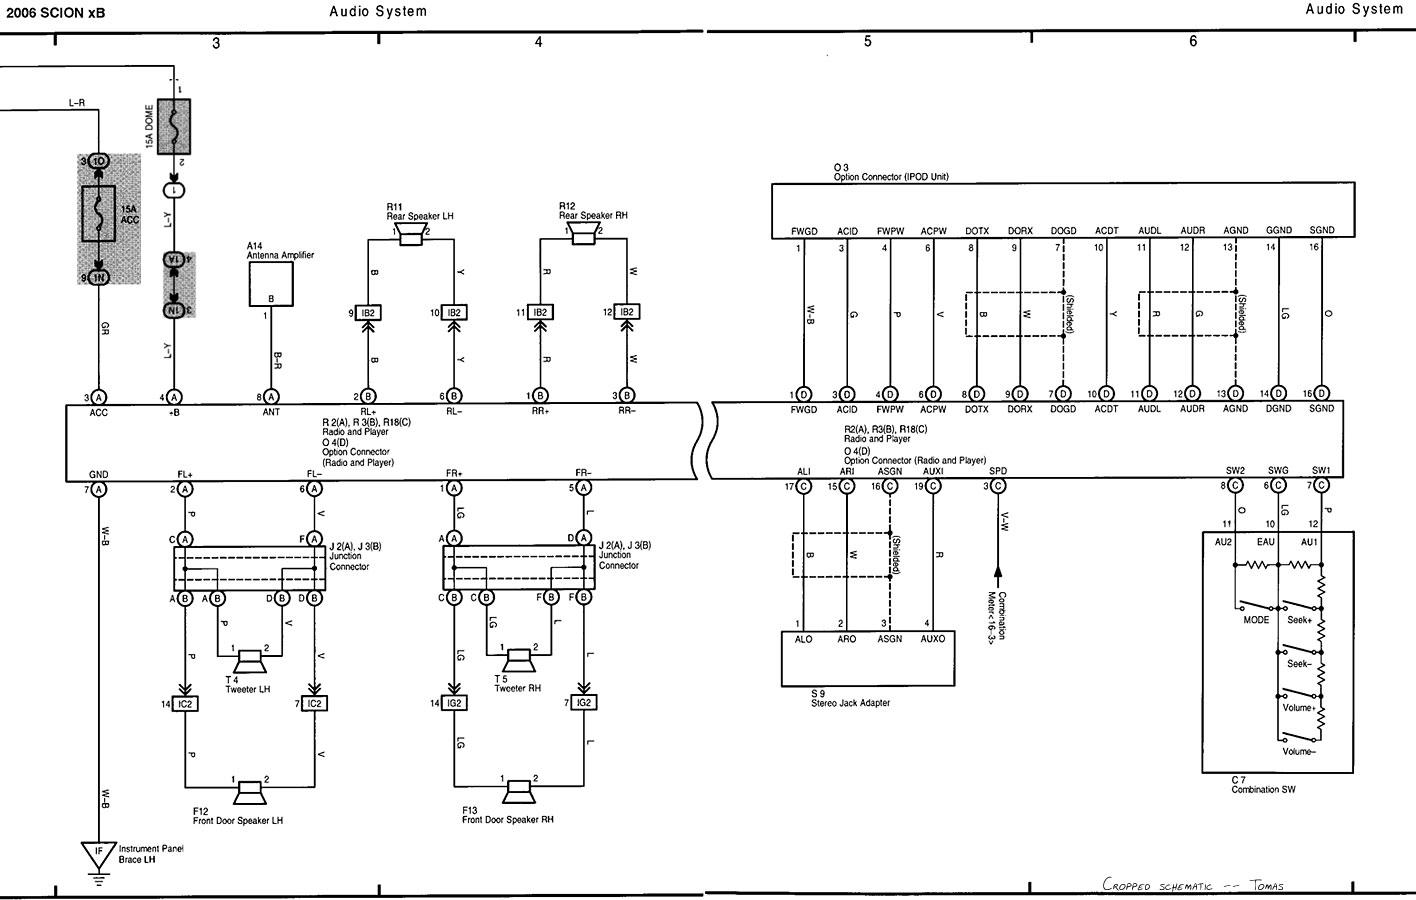 medium resolution of scion 4 wire sensor diagram wiring diagram explained pin wiring diagram pnp wiring diagram 2004